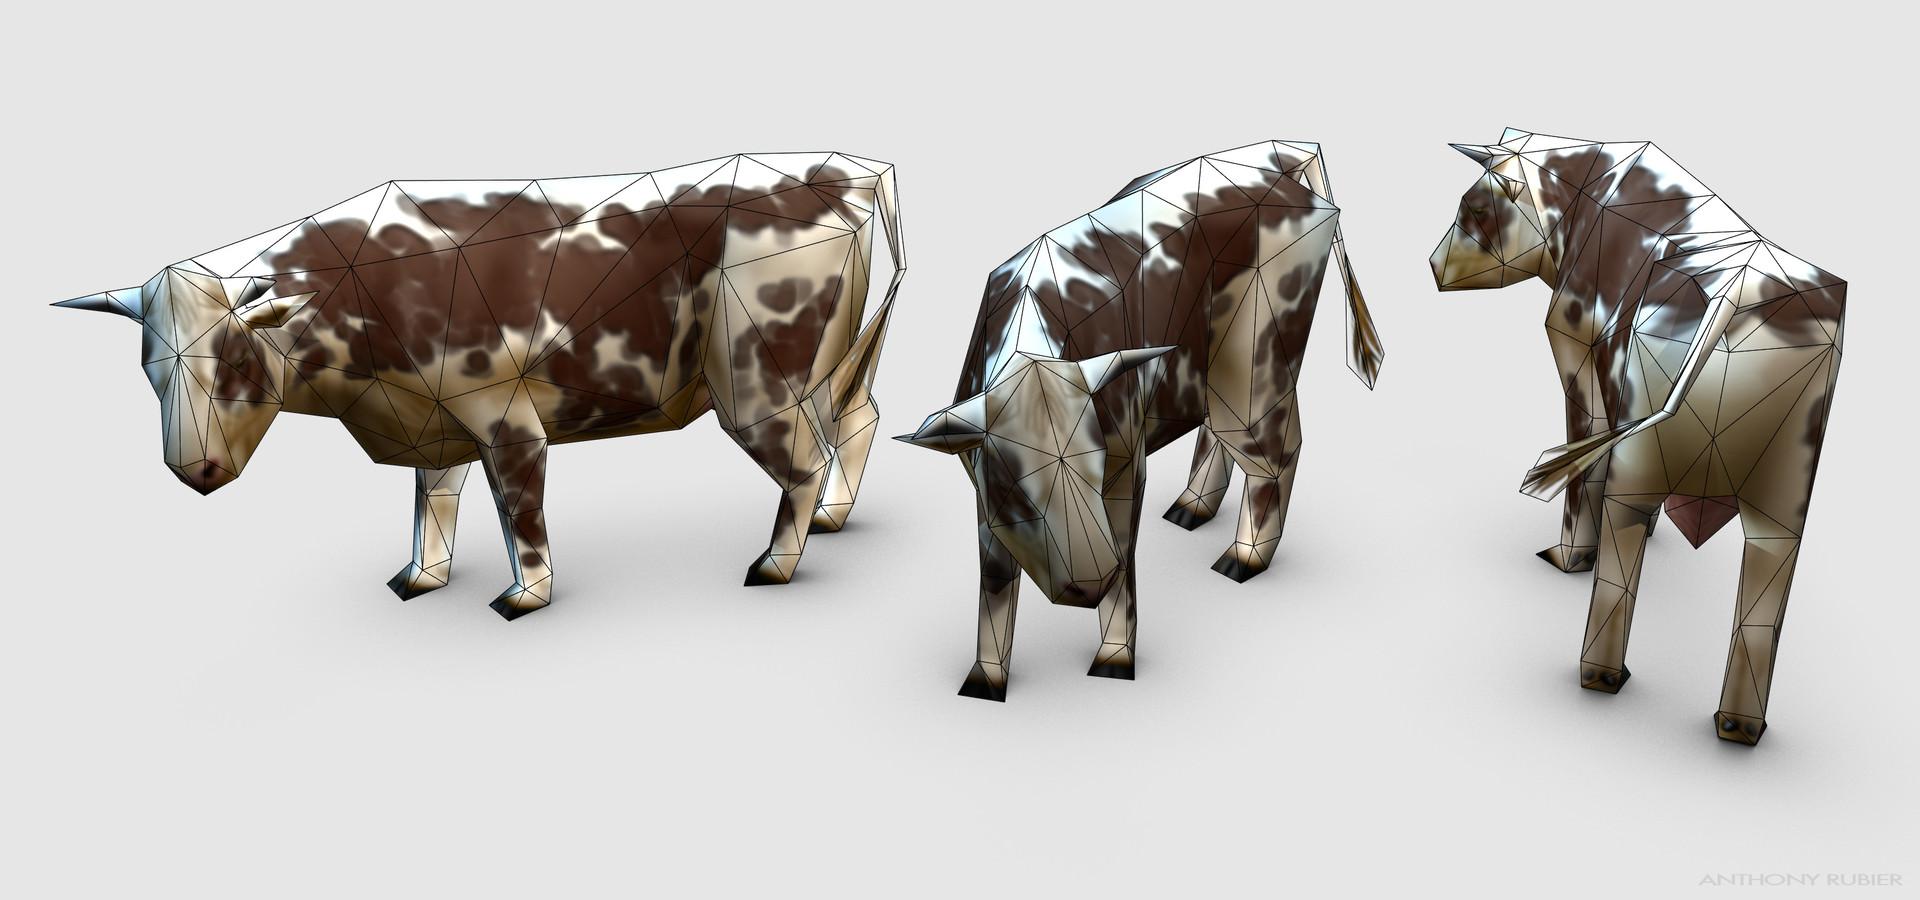 Anthony rubier render mesh vache 2